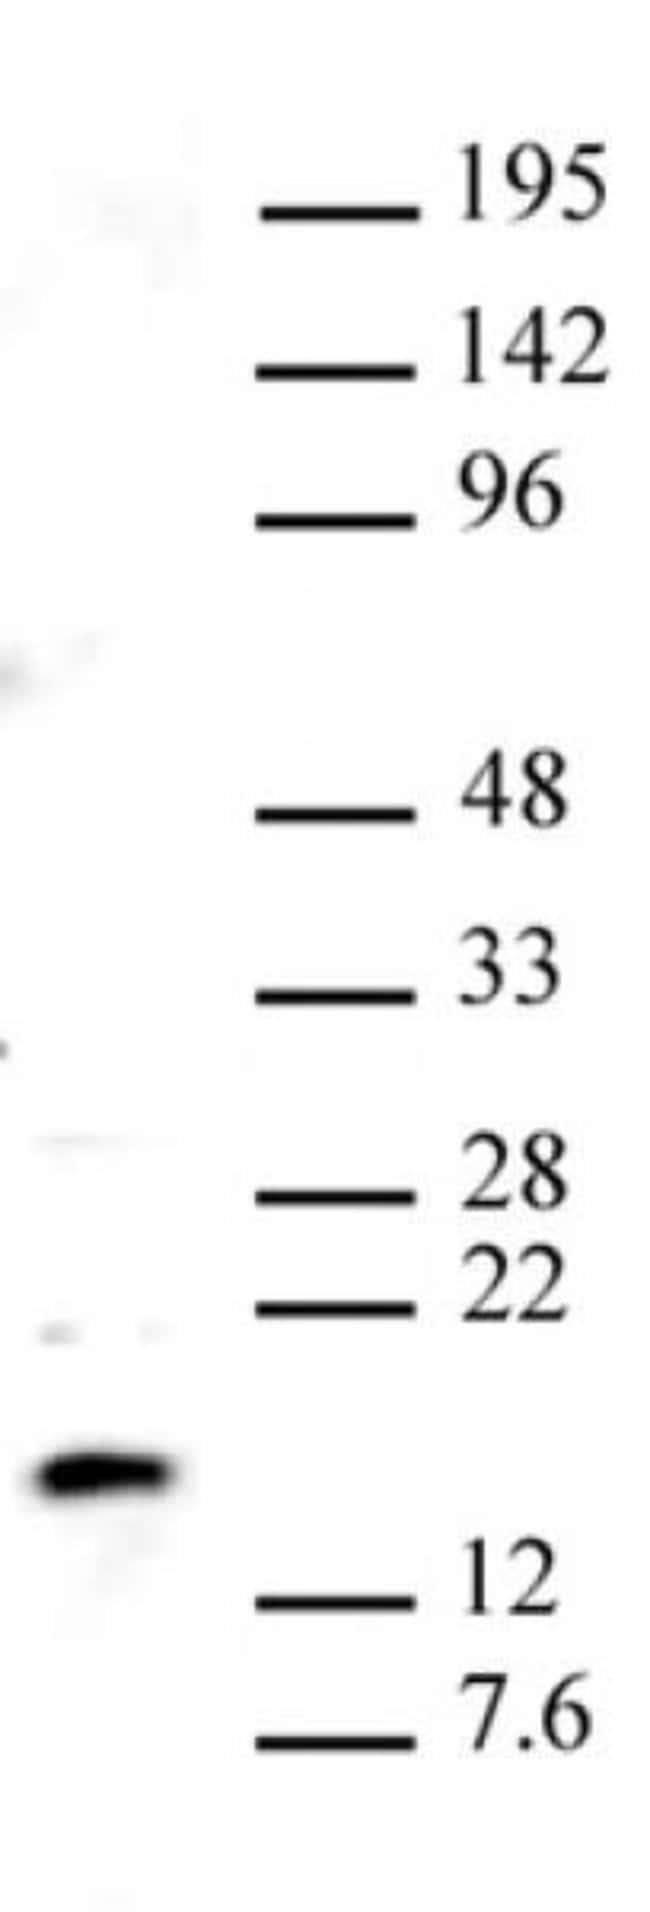 Pht1 / Histone H2A.Z Rabbit anti-Yeast, Unconjugated, Polyclonal, Active